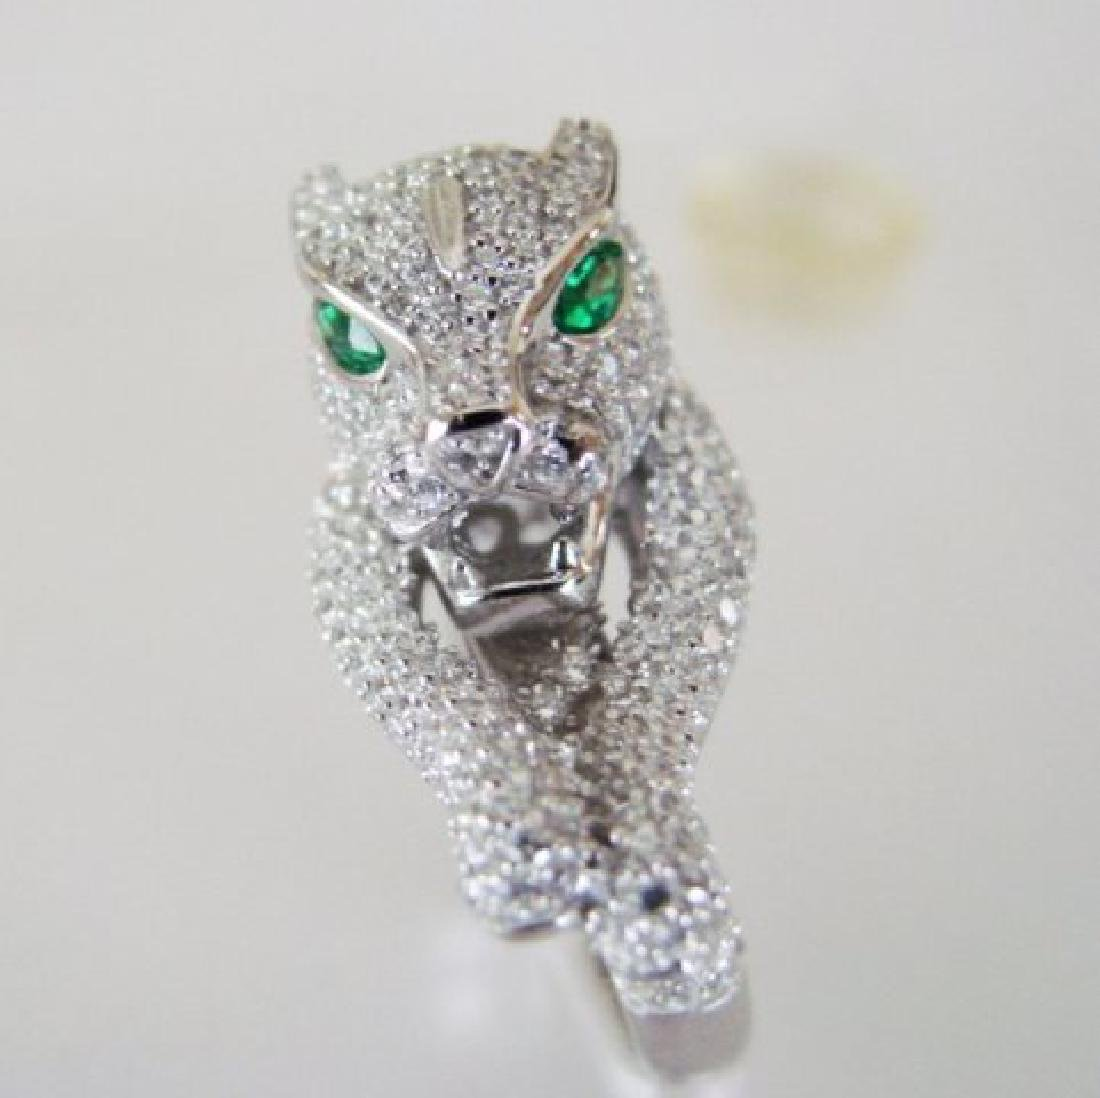 Creation Diamond Juguar Ring 4.67Ct18k W/g Overaly - 2